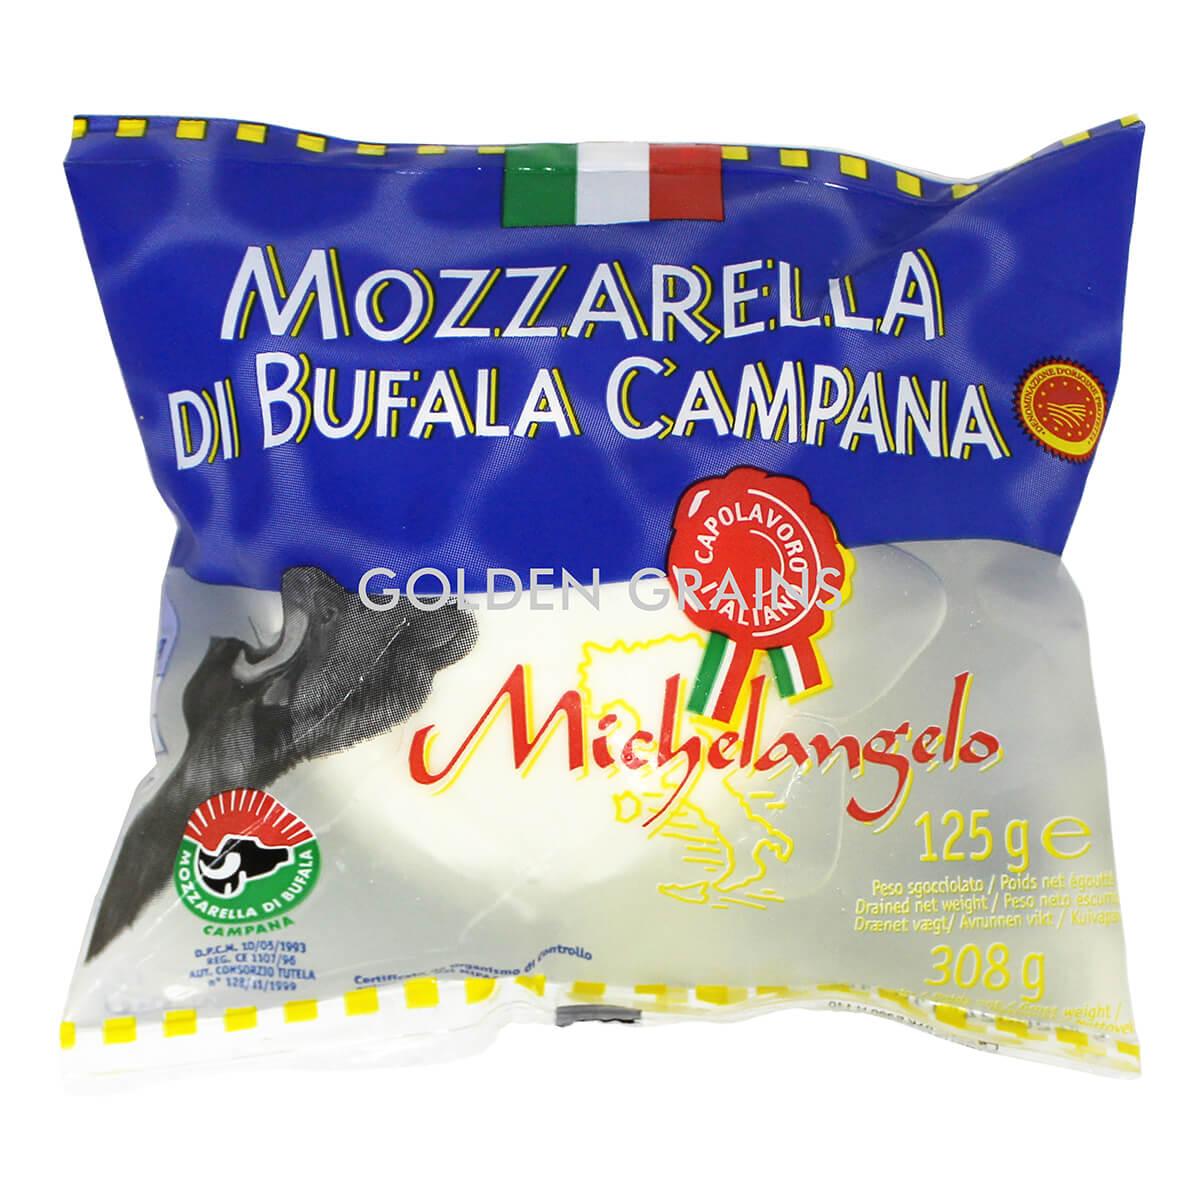 Michelangelo Mozzarella Bufala